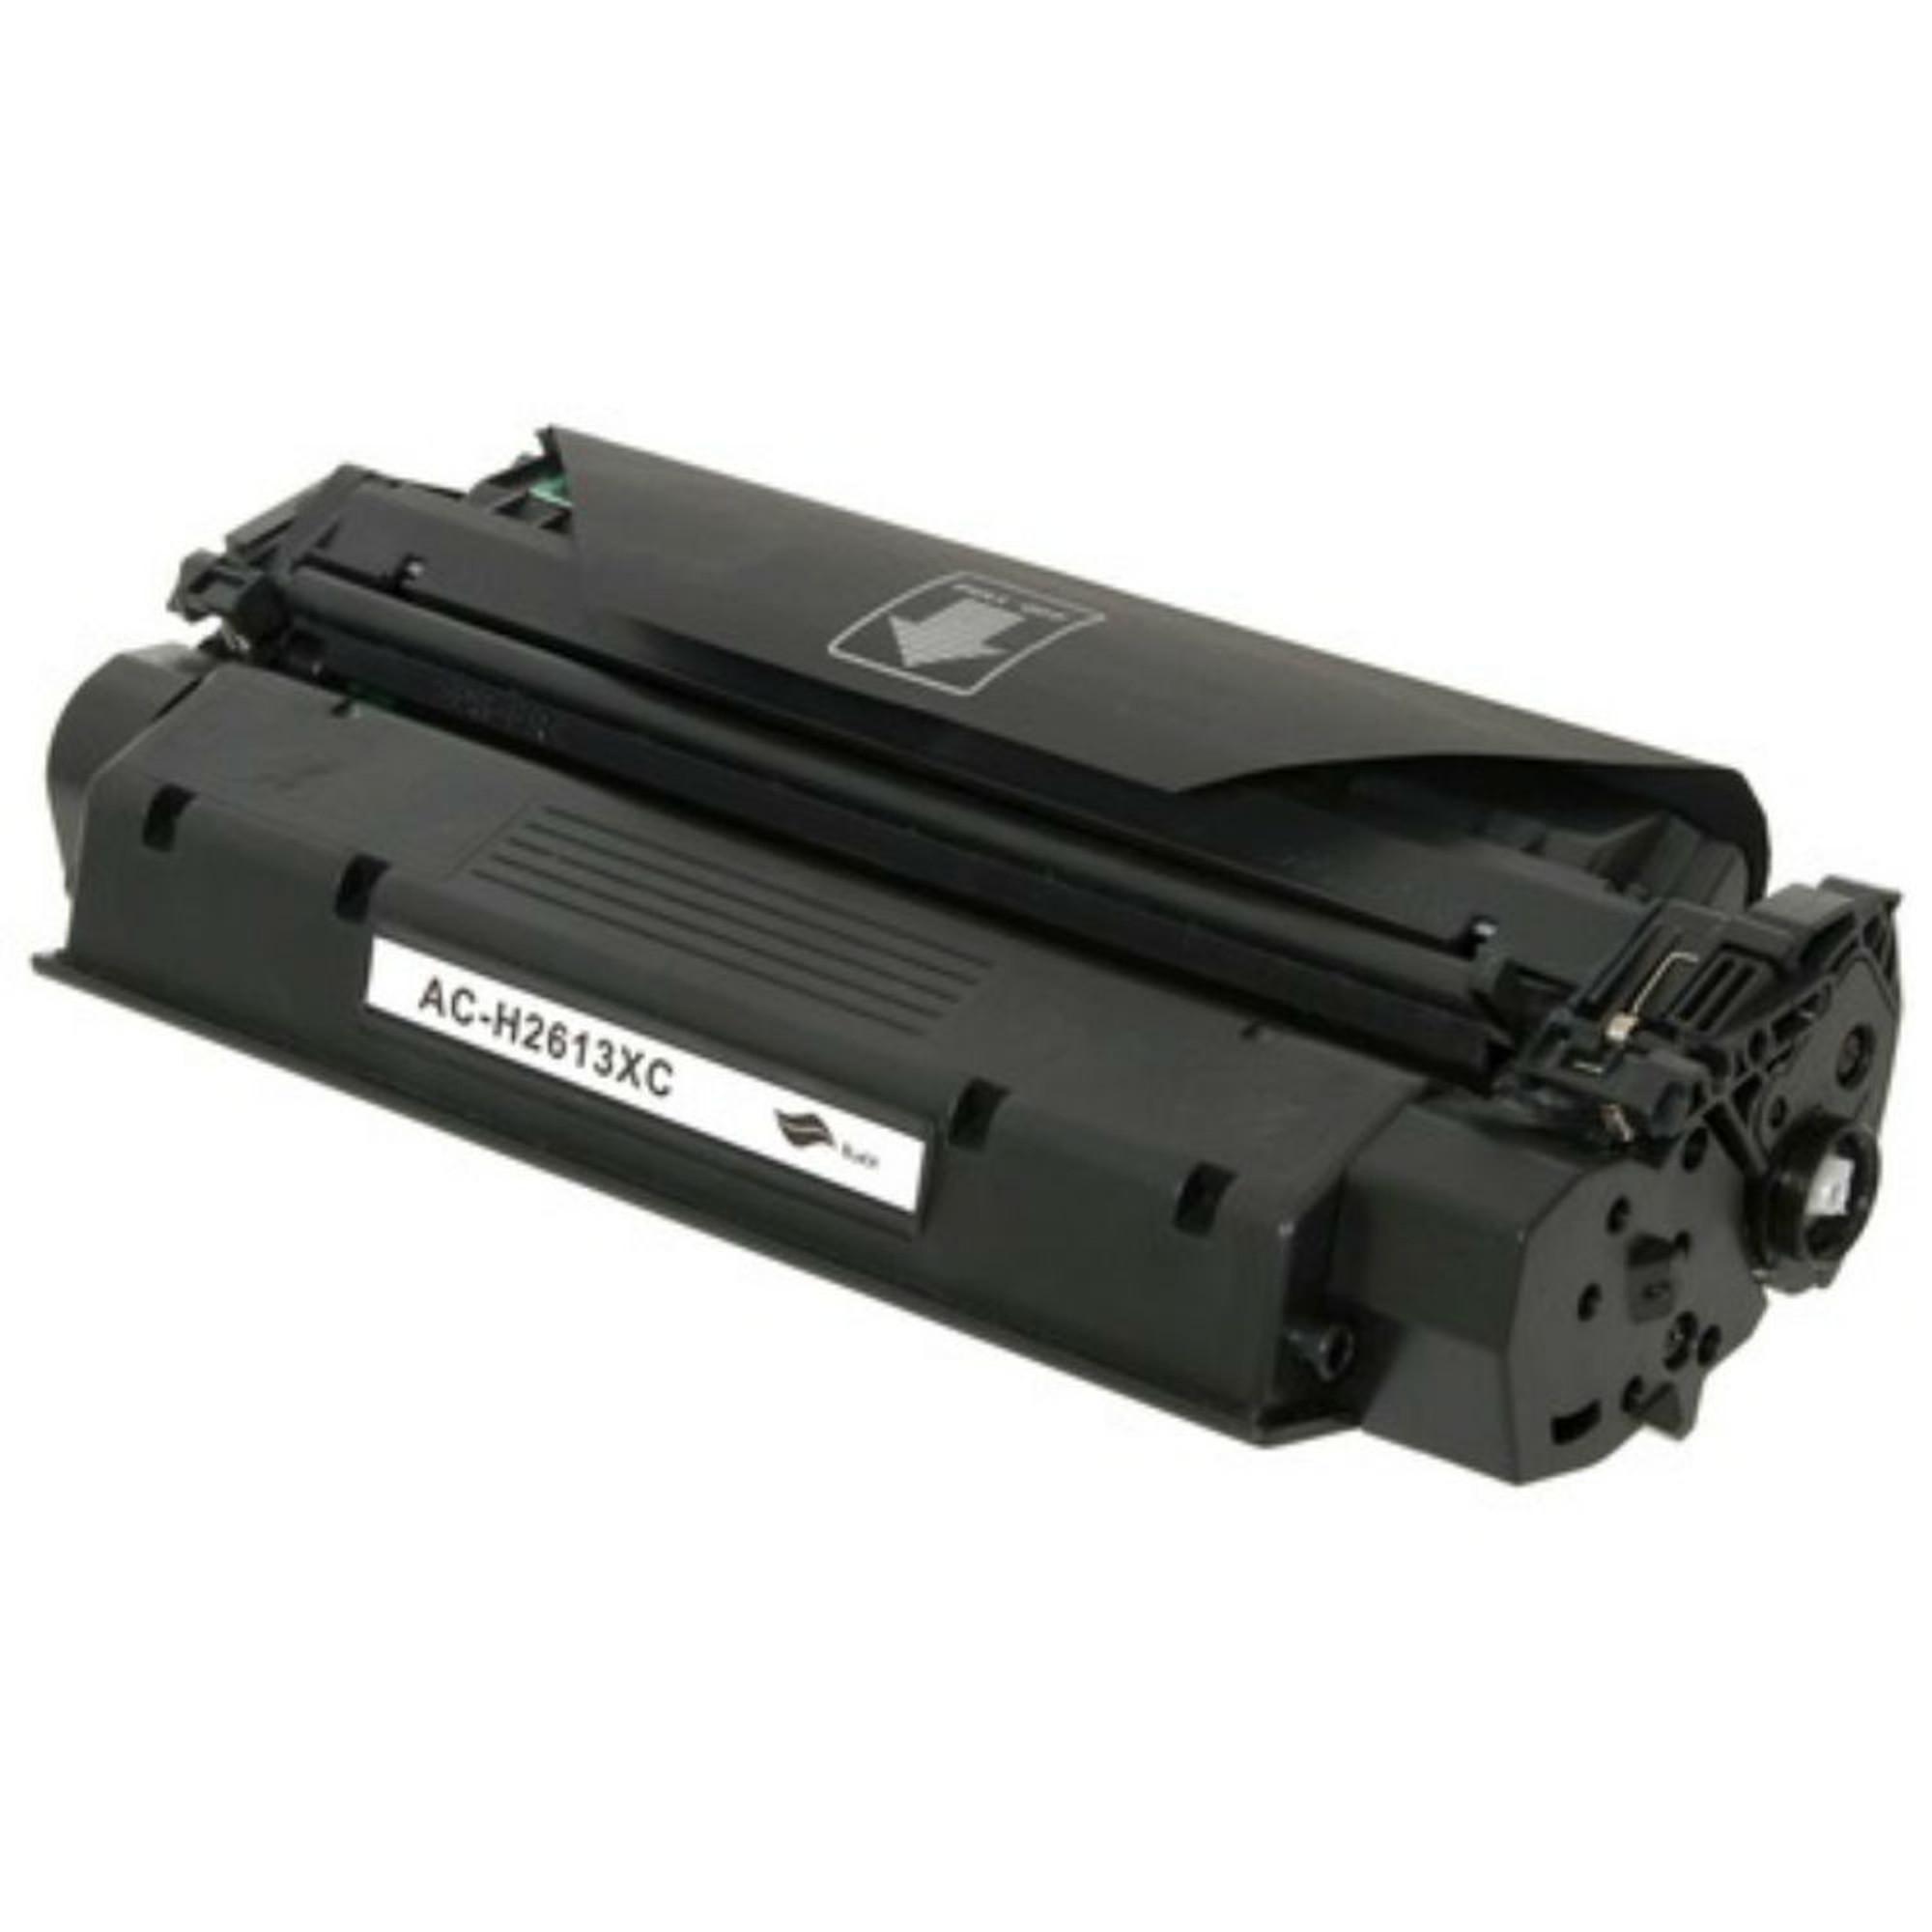 micr toner for the hp laserjet 1300 1300n 1300xi printers. Black Bedroom Furniture Sets. Home Design Ideas